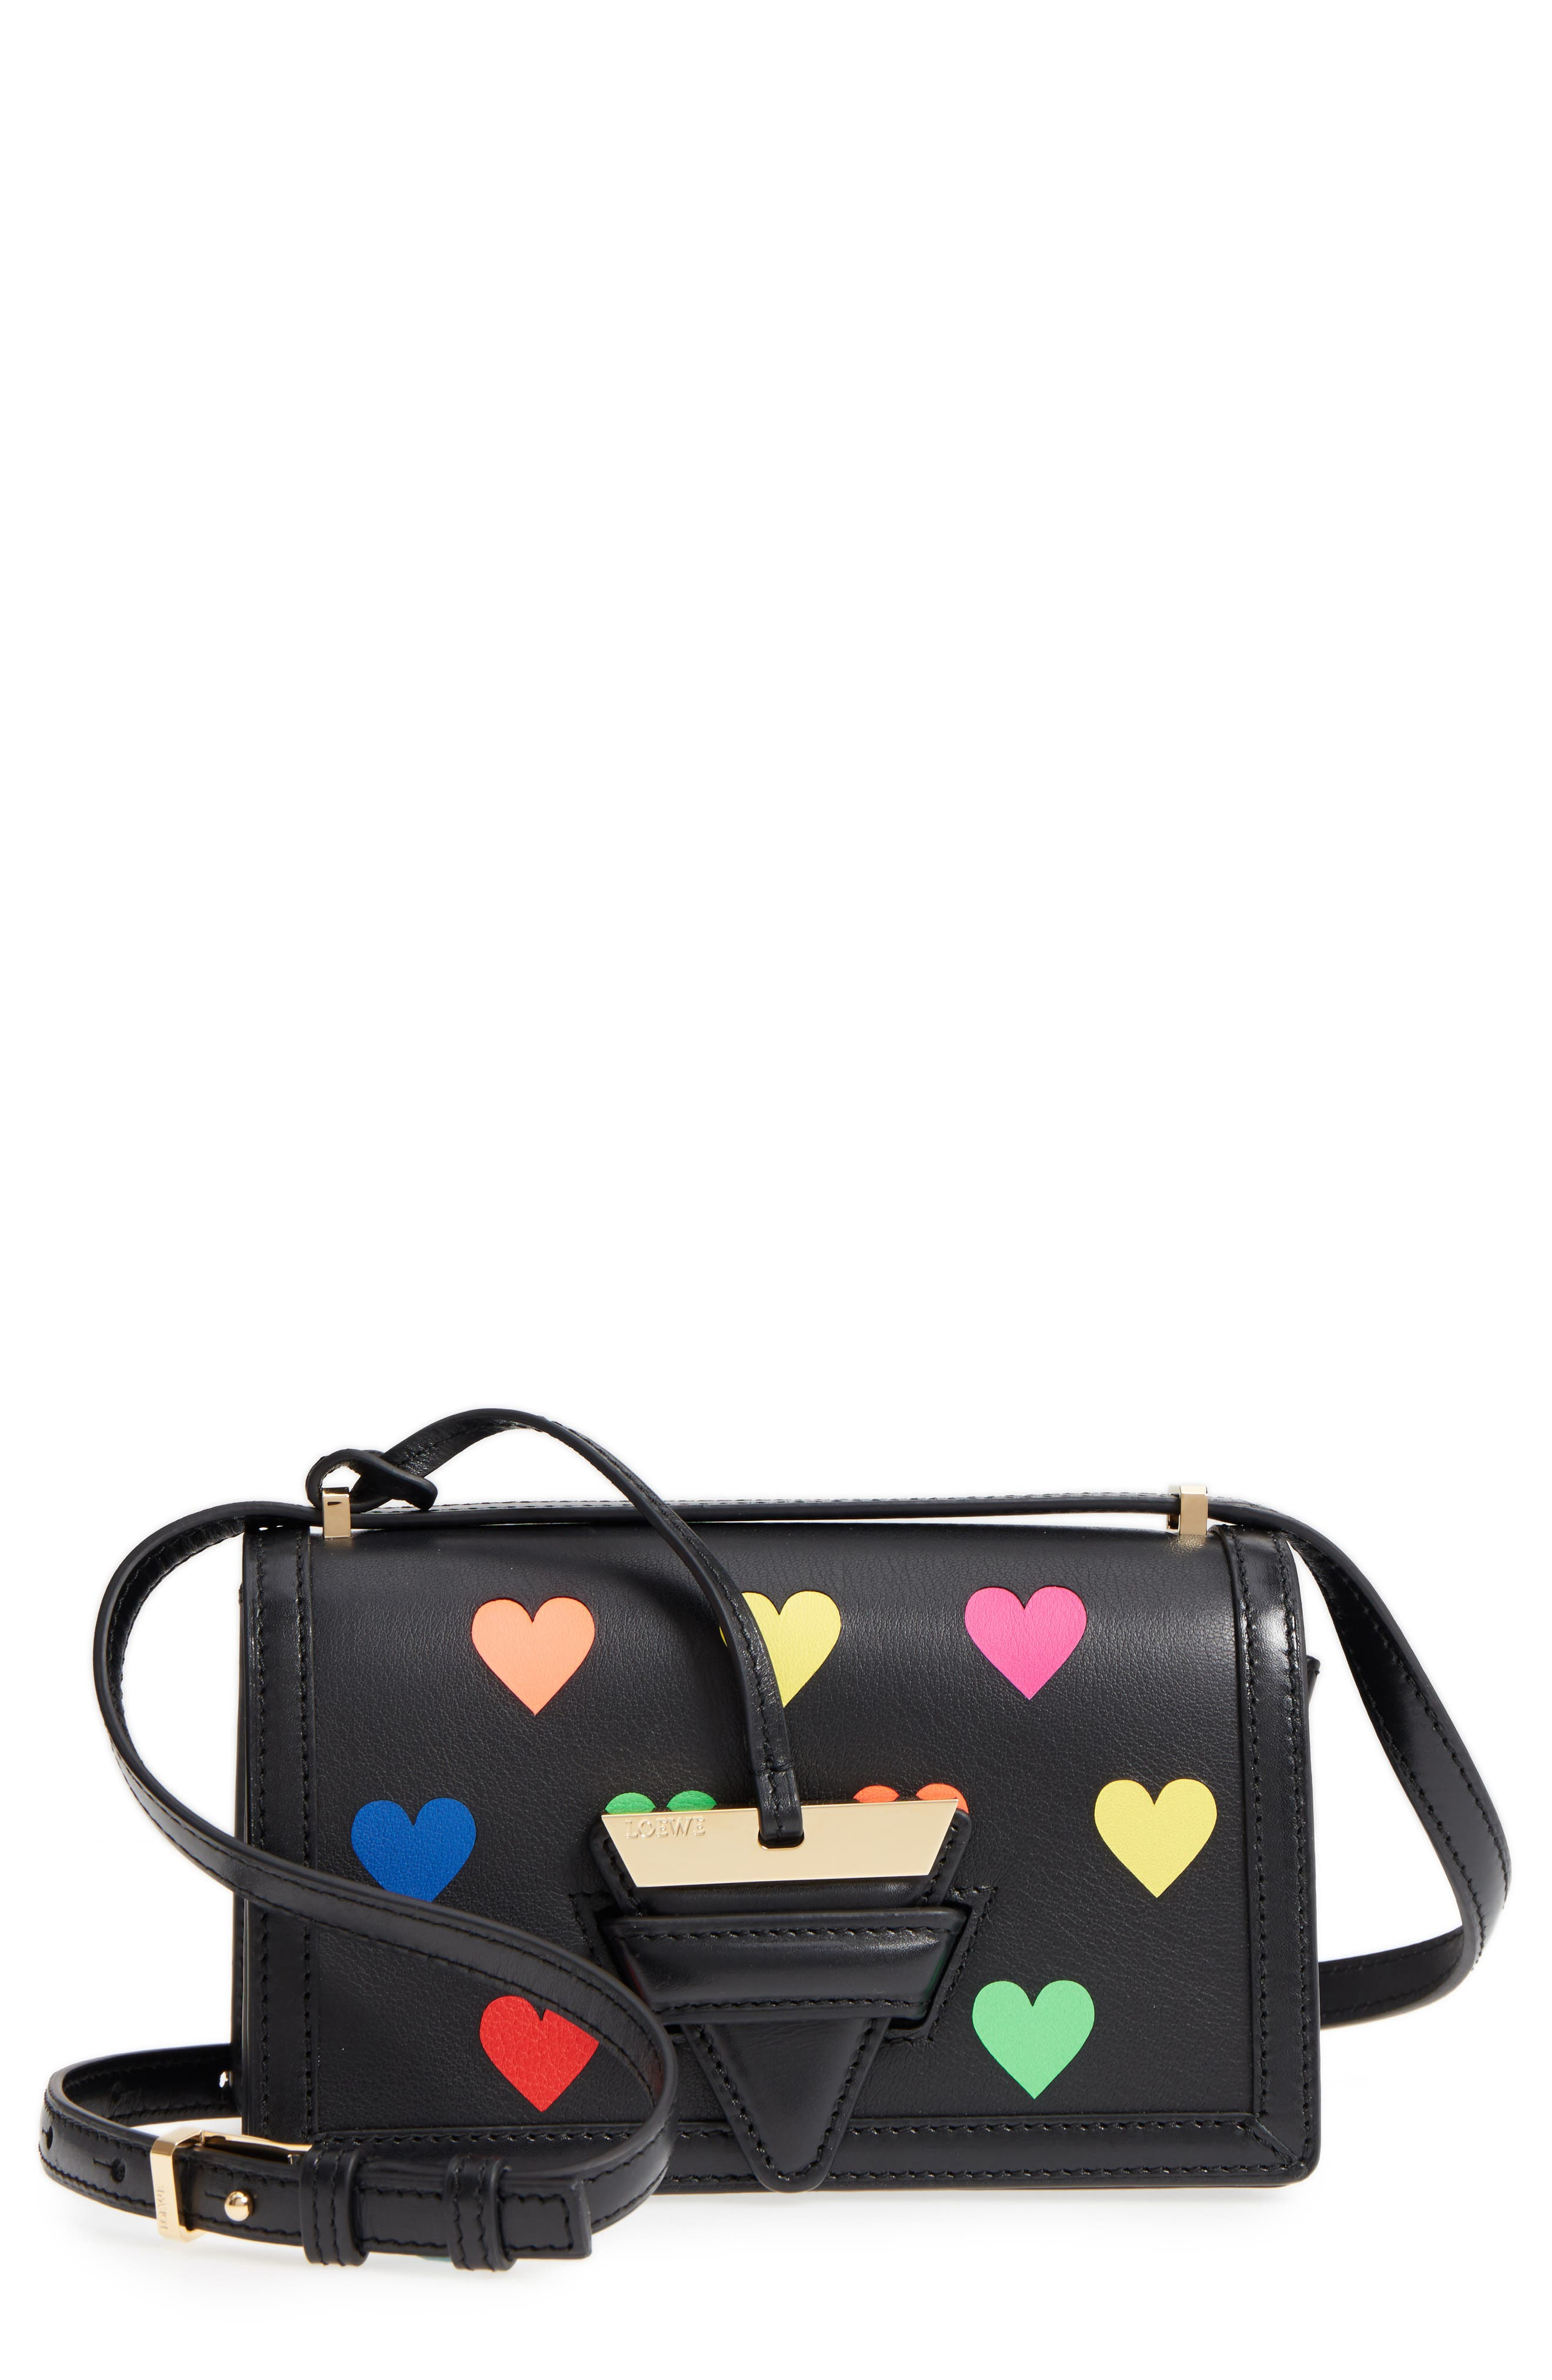 Loewe Mini Barcelona Hearts Calfskin Leather Crossbody Bag